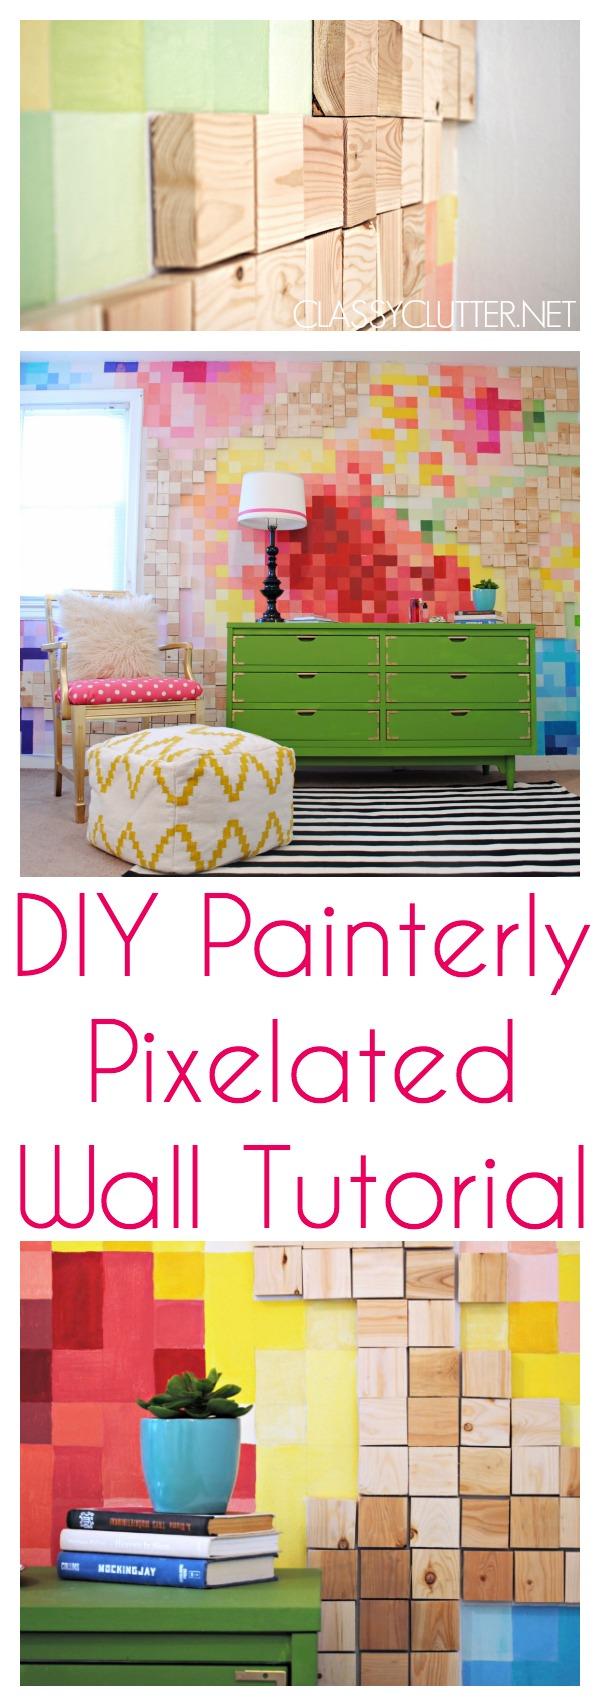 DIY Painterly Pixelated Wall Tutorial